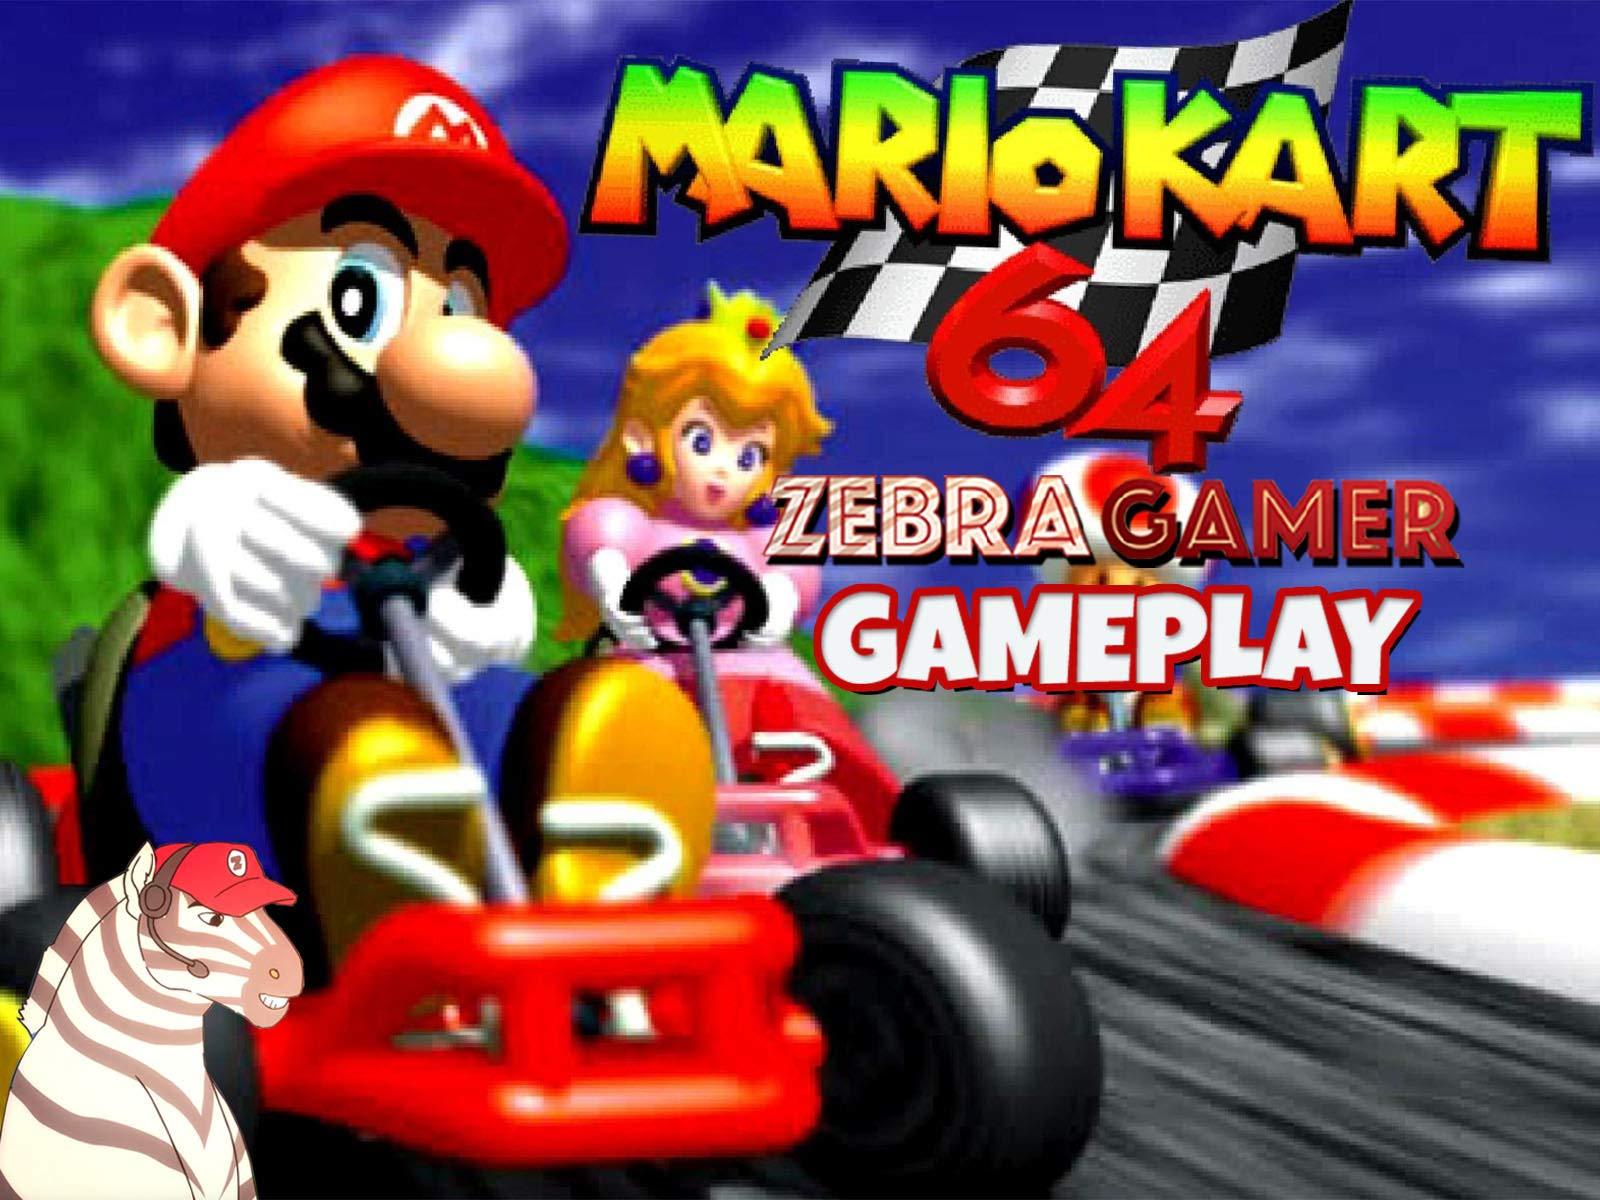 Clip: Mario Kart 64 Gameplay - Zebra Gamer - Season 1